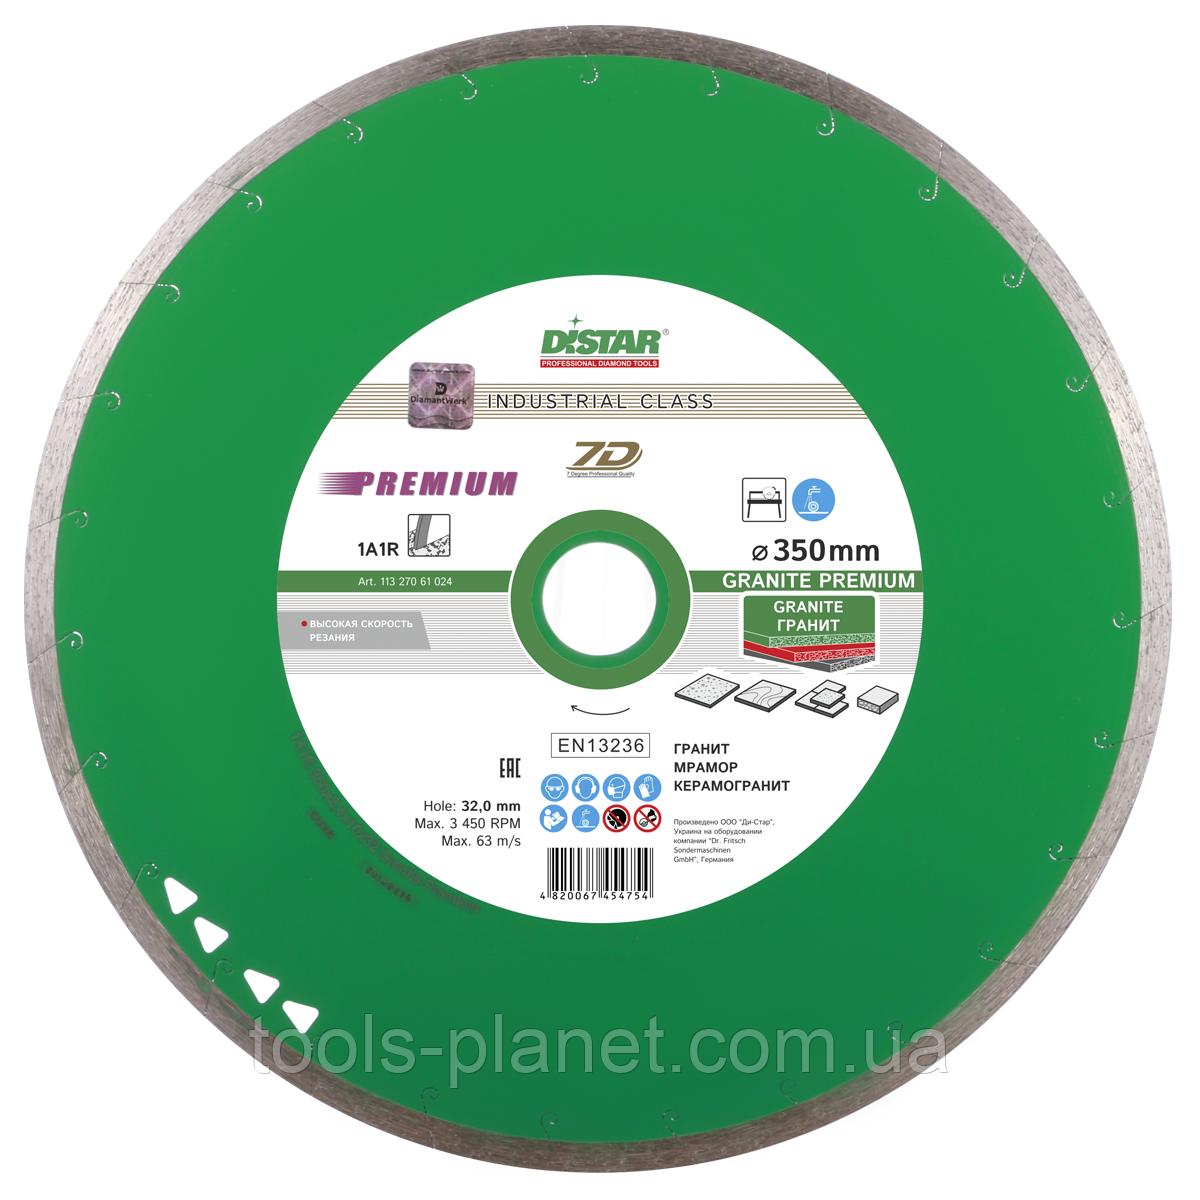 Алмазный диск Distar 1A1R 350 x 2,4 x 10 x 32 Granite Premium 7D (11327061024)